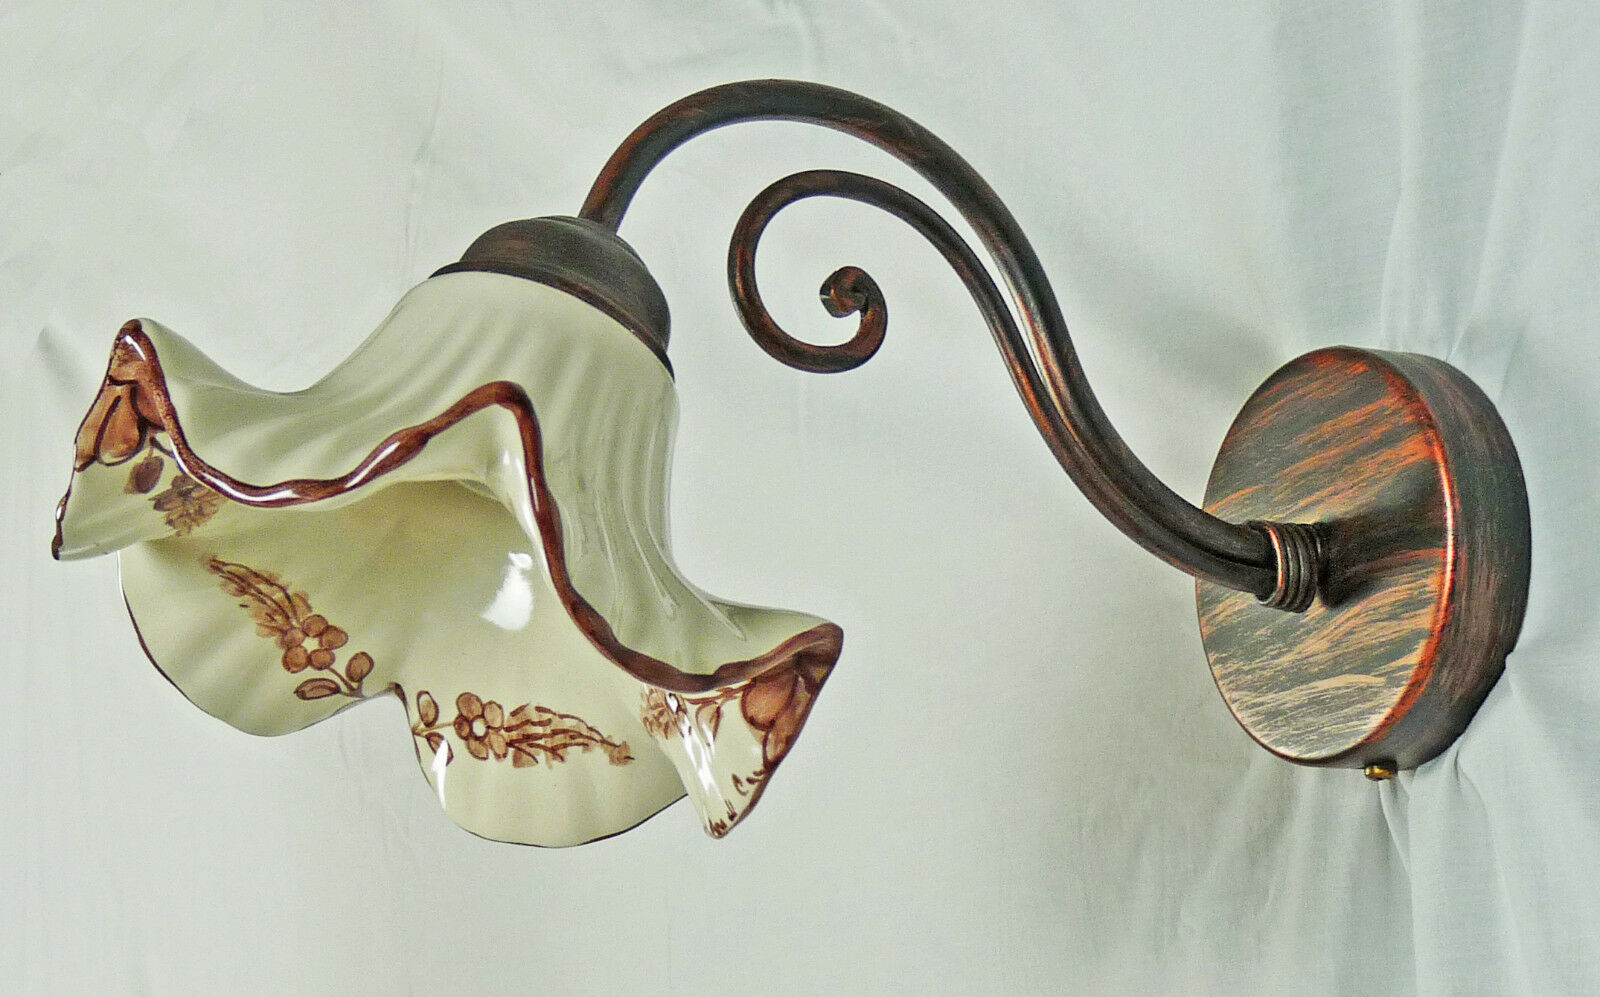 Applique ceramica led led led ferro battuto artigianale rustico